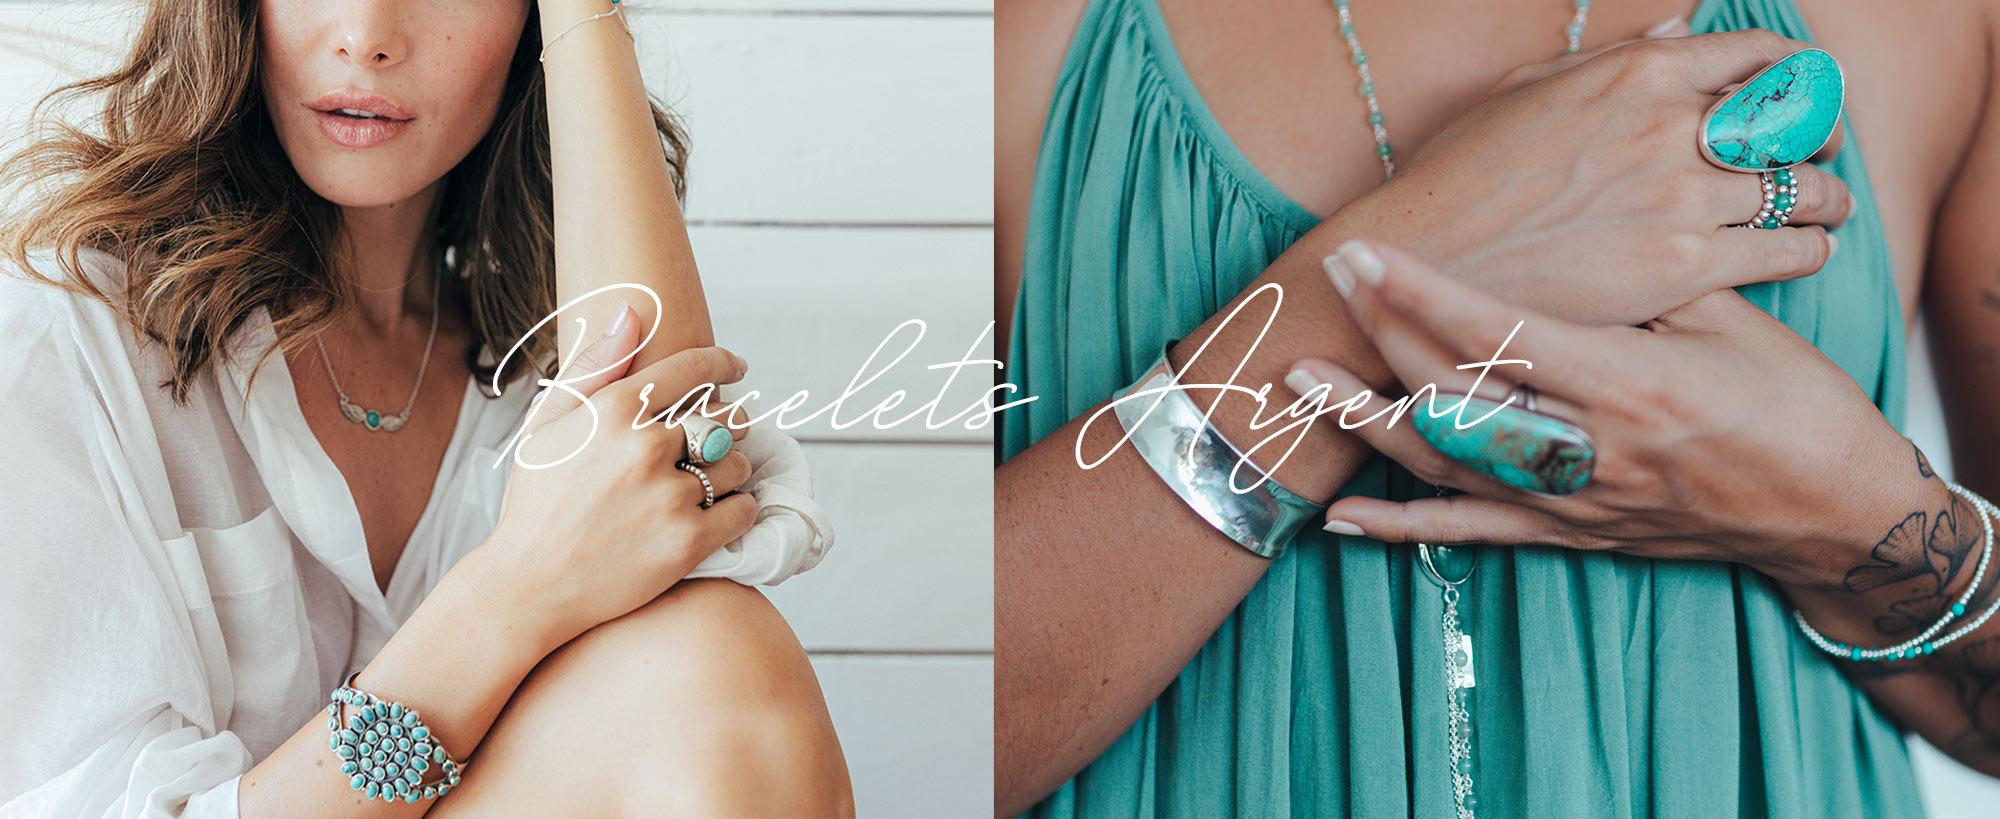 bracelt-argent-slider